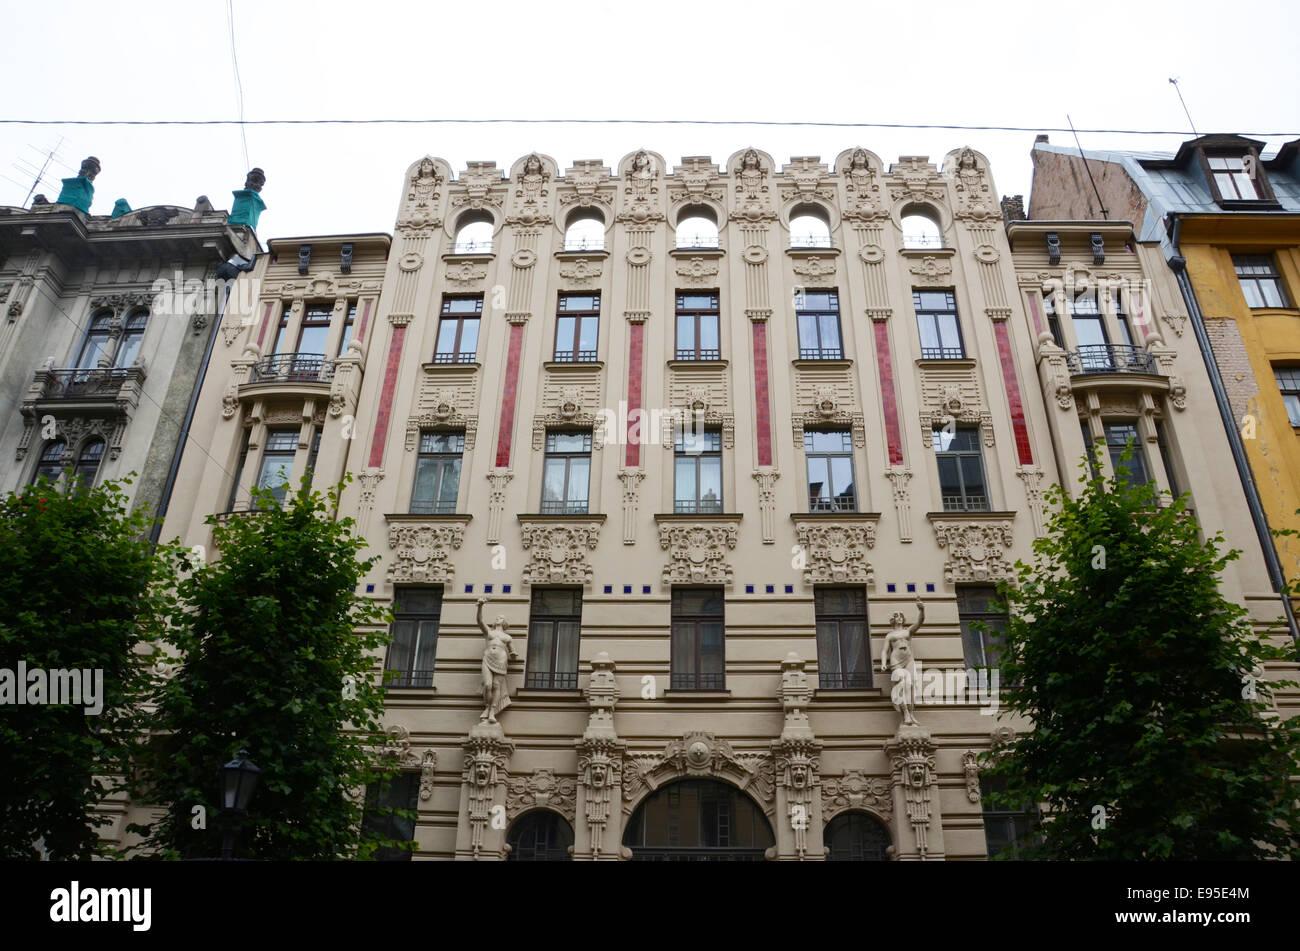 Strēlnieku iela 9, Rīga, LV-1010, Latvia - Stock Image